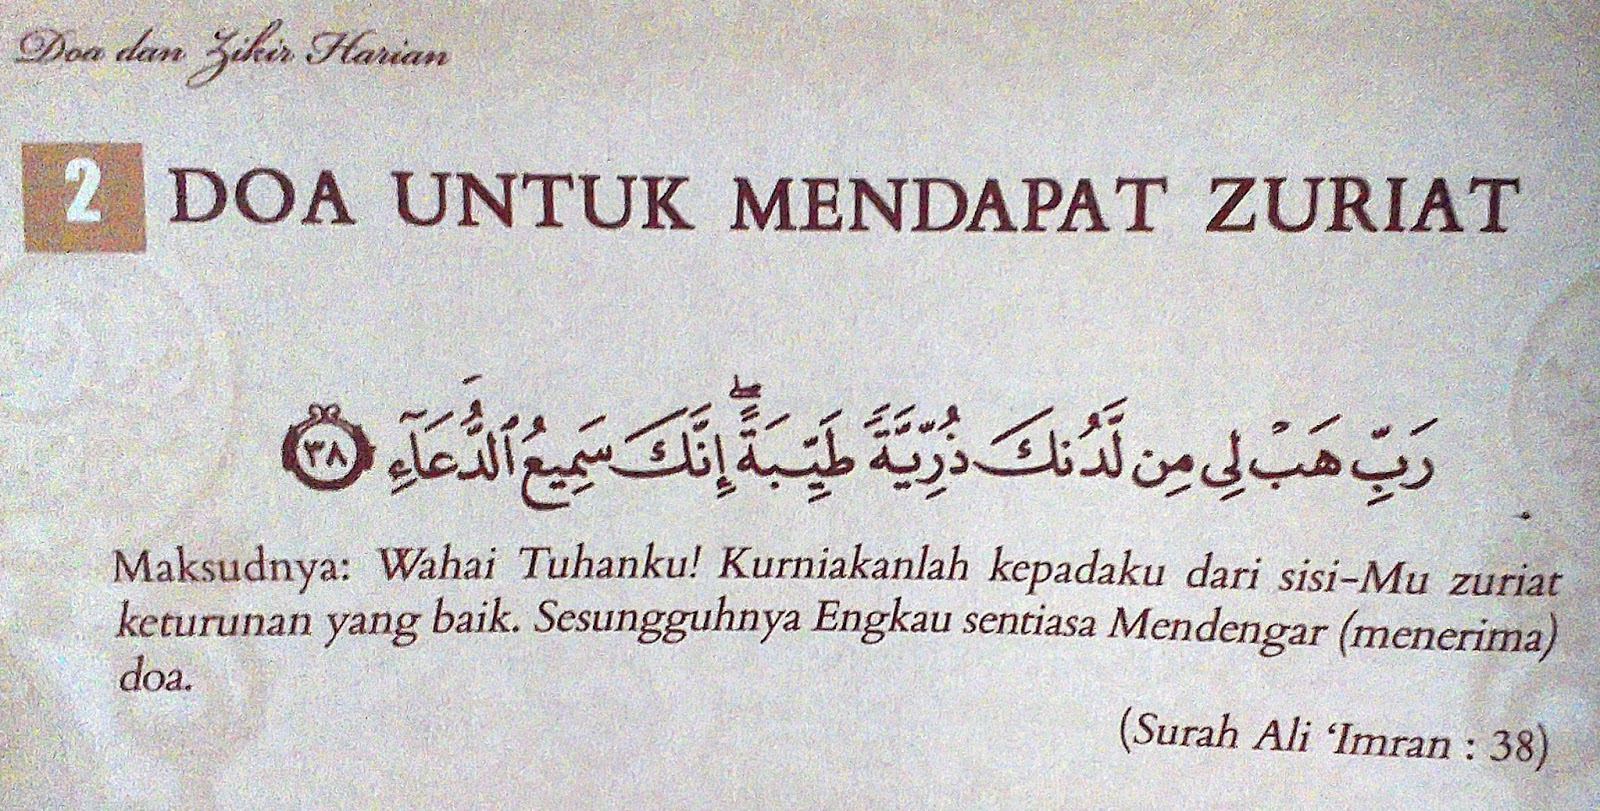 Image result for doa mendapat zuriat